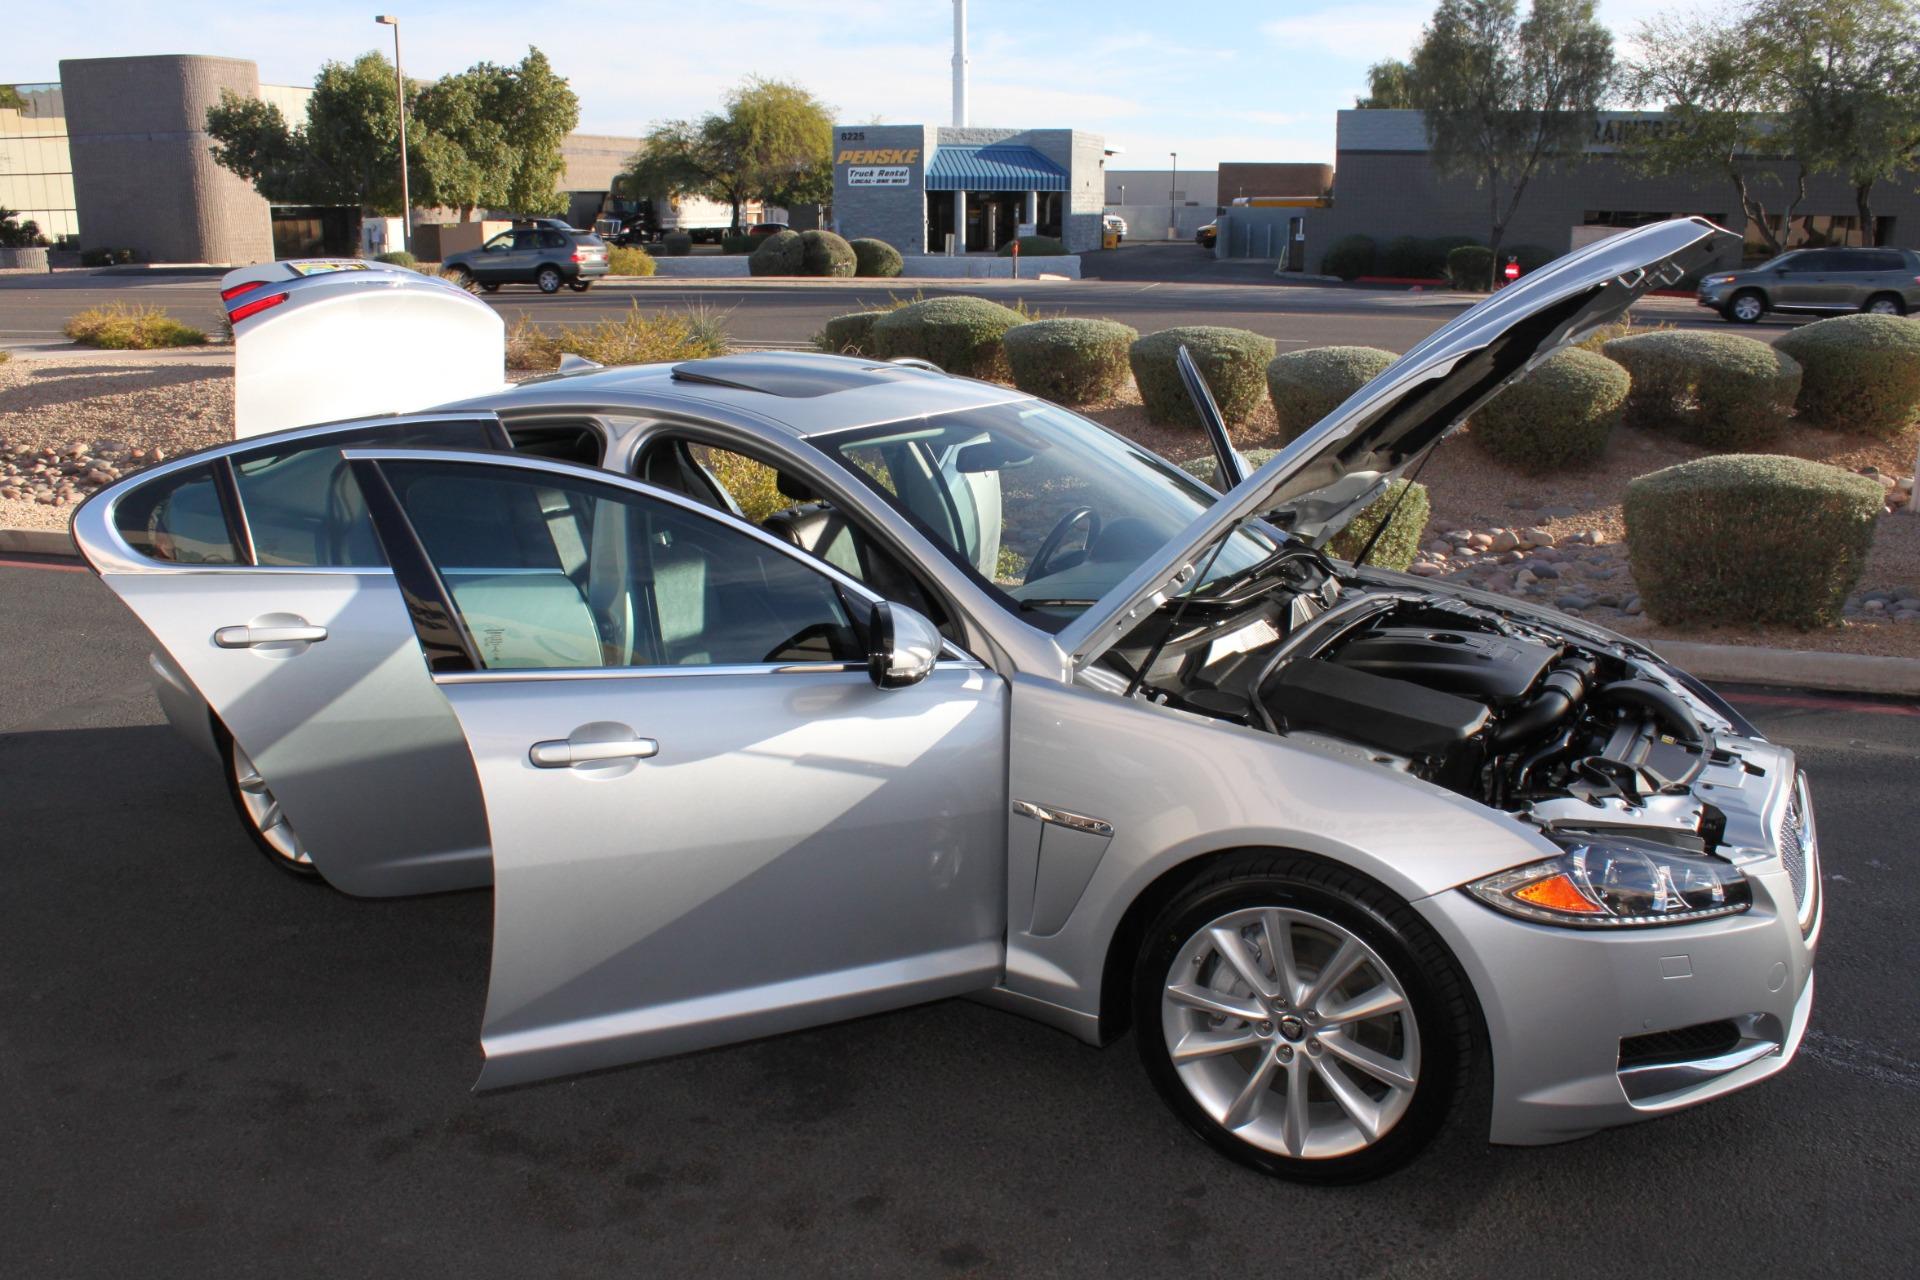 Used-2013-Jaguar-XF-I4-RWD-Toyota